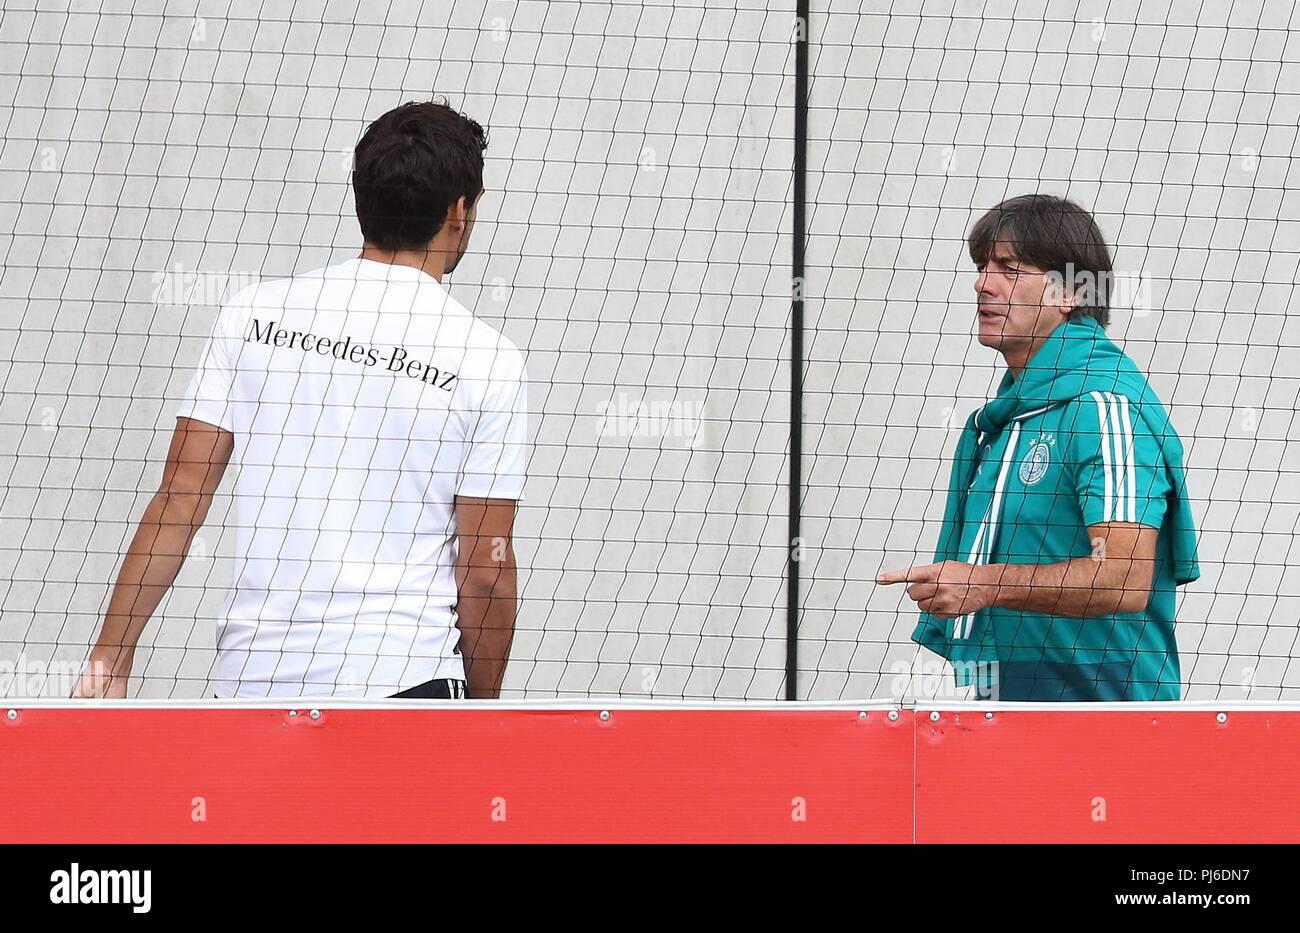 firo: 04.09.2018, football, national team, training, Mats Hummels, national coach Joachim Lv? w, Loew, half figure, gesture, Germany   usage worldwide - Stock Image